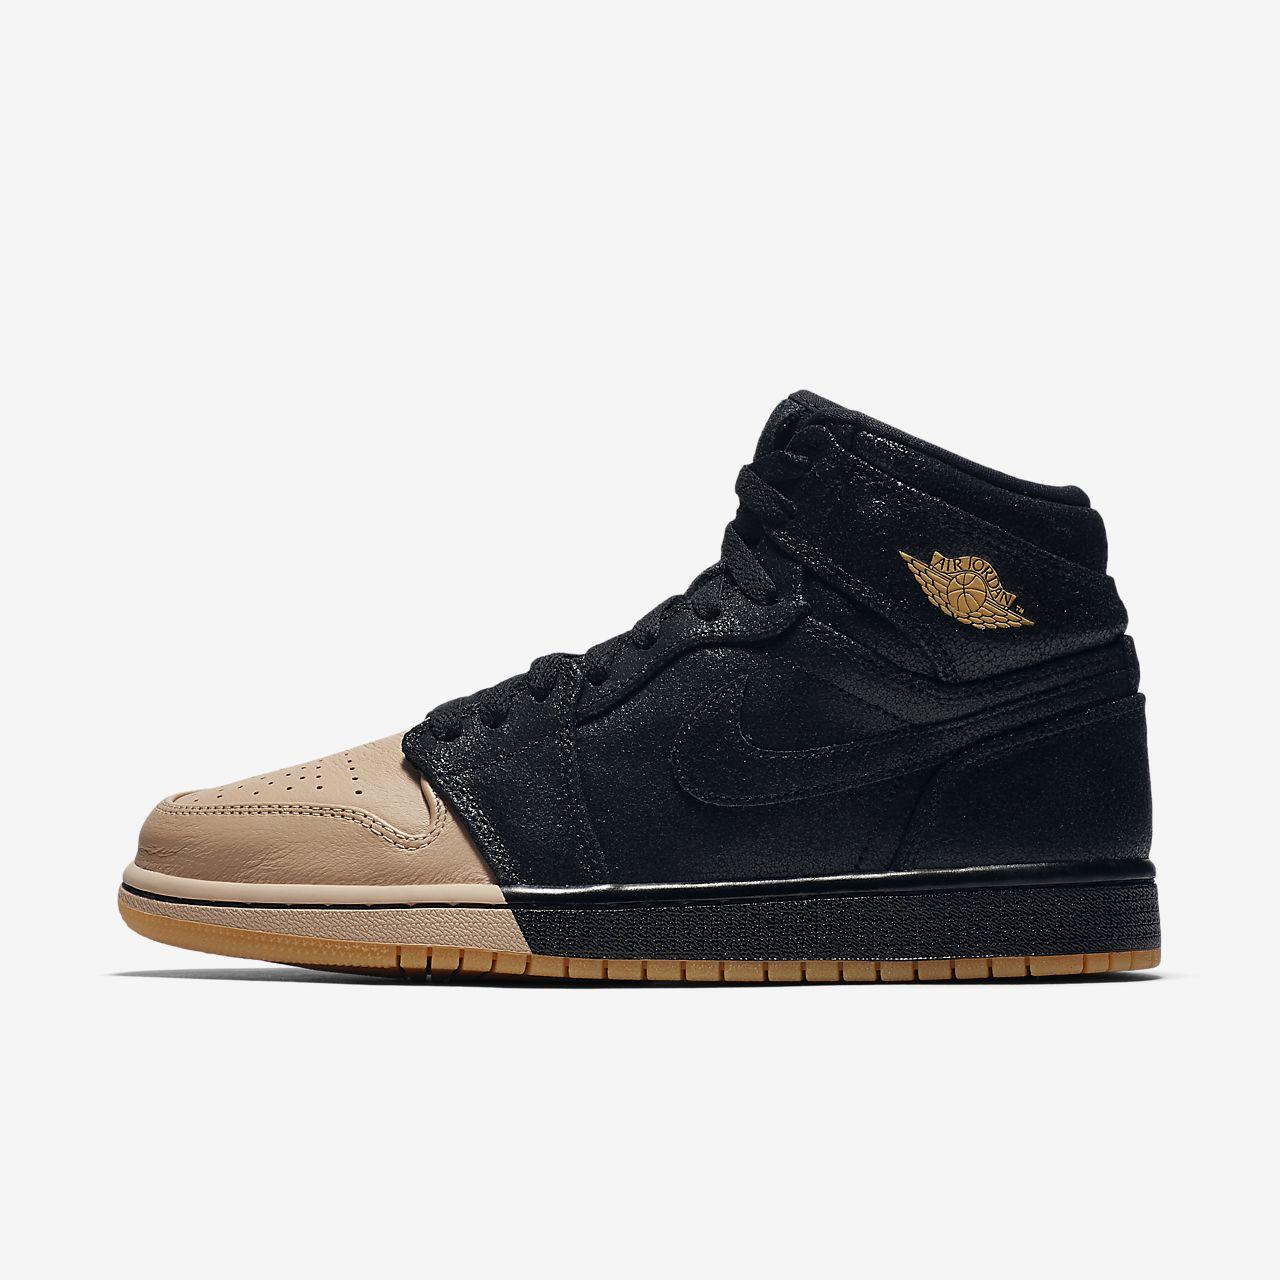 39a8107929a9 Nike Air Jordan 1 Retro High Premium Women s Shoe. Nike.com GB